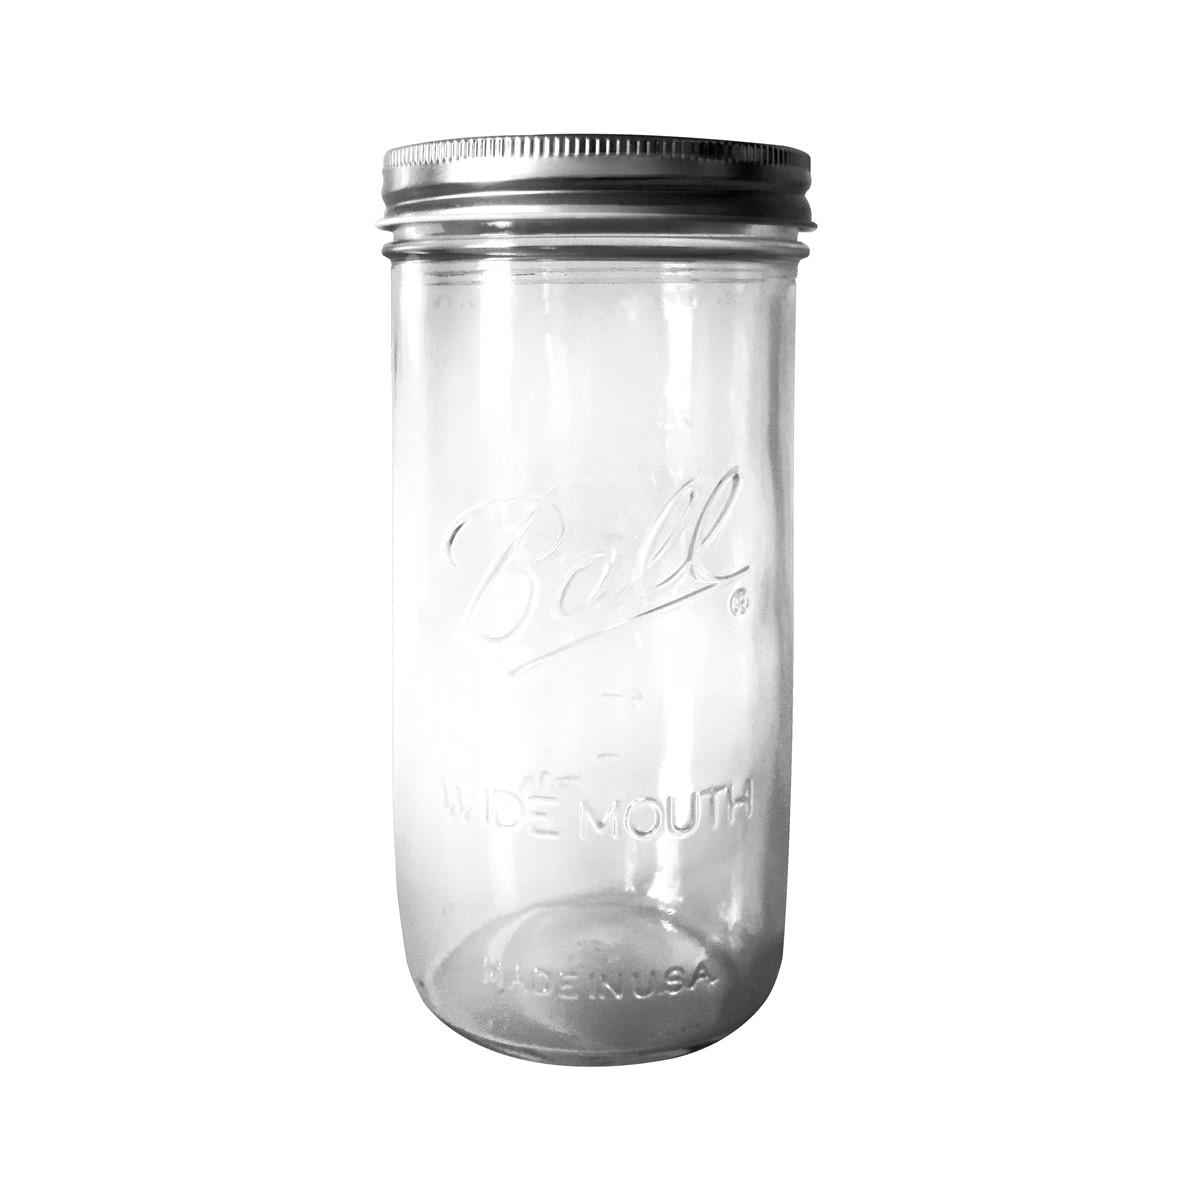 Lampe bocal en verre gris